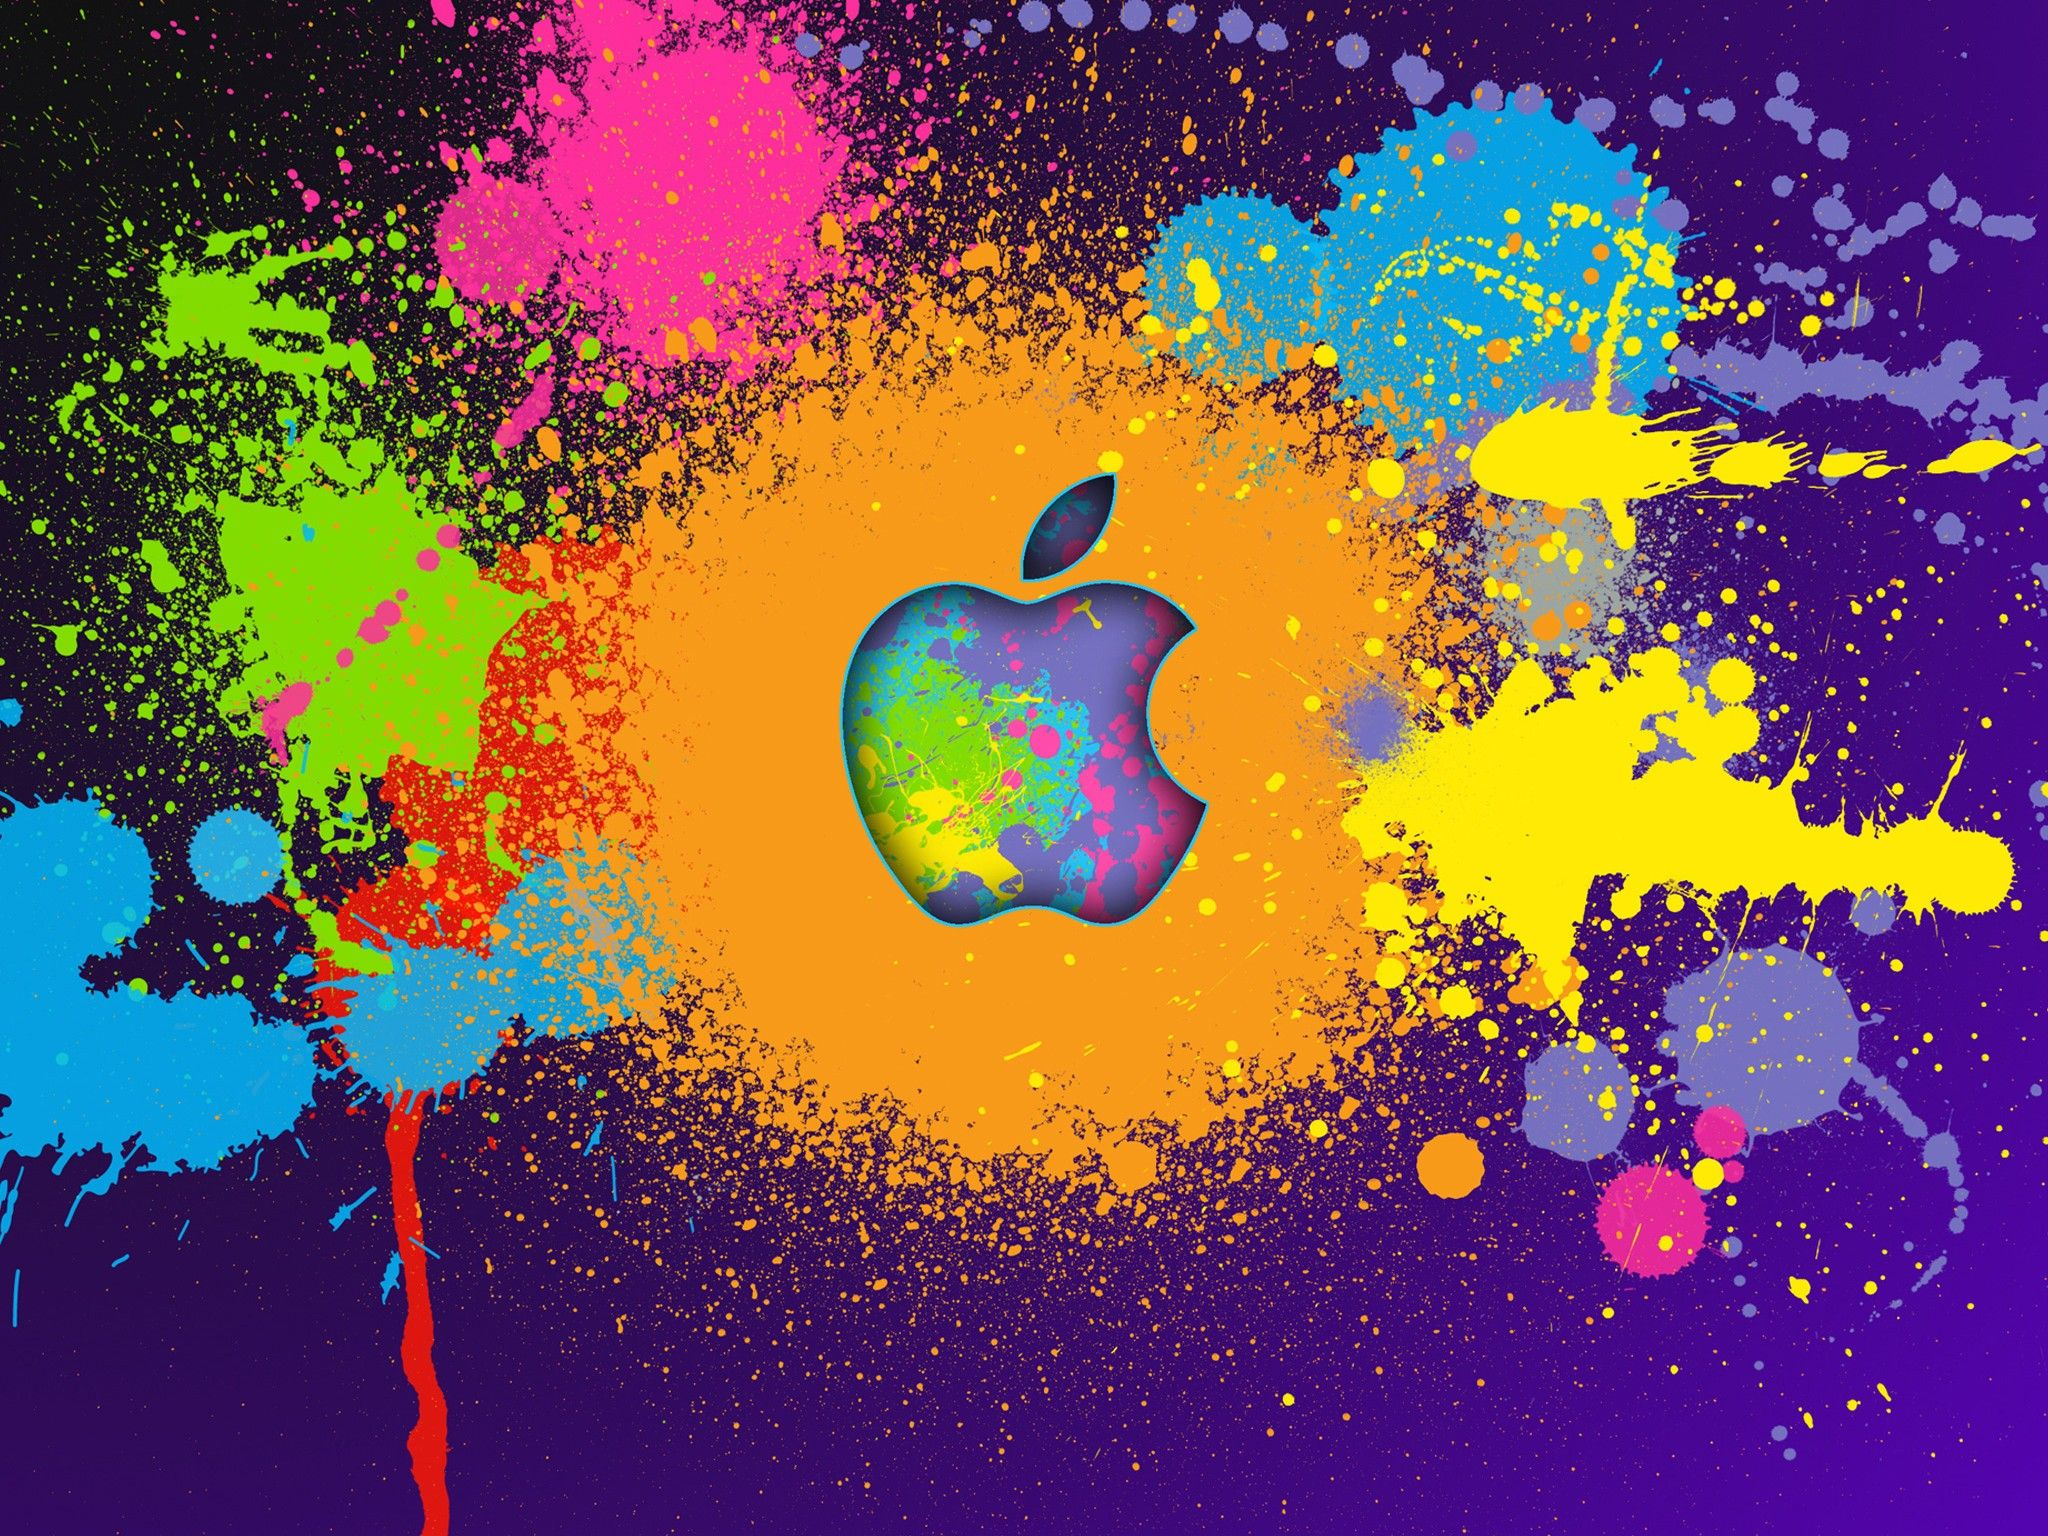 Hd Ipad Wallpapers 2048x1536 Wallpapersafari Apple Logo Wallpaper Apple Ipad Wallpaper Apple Wallpaper